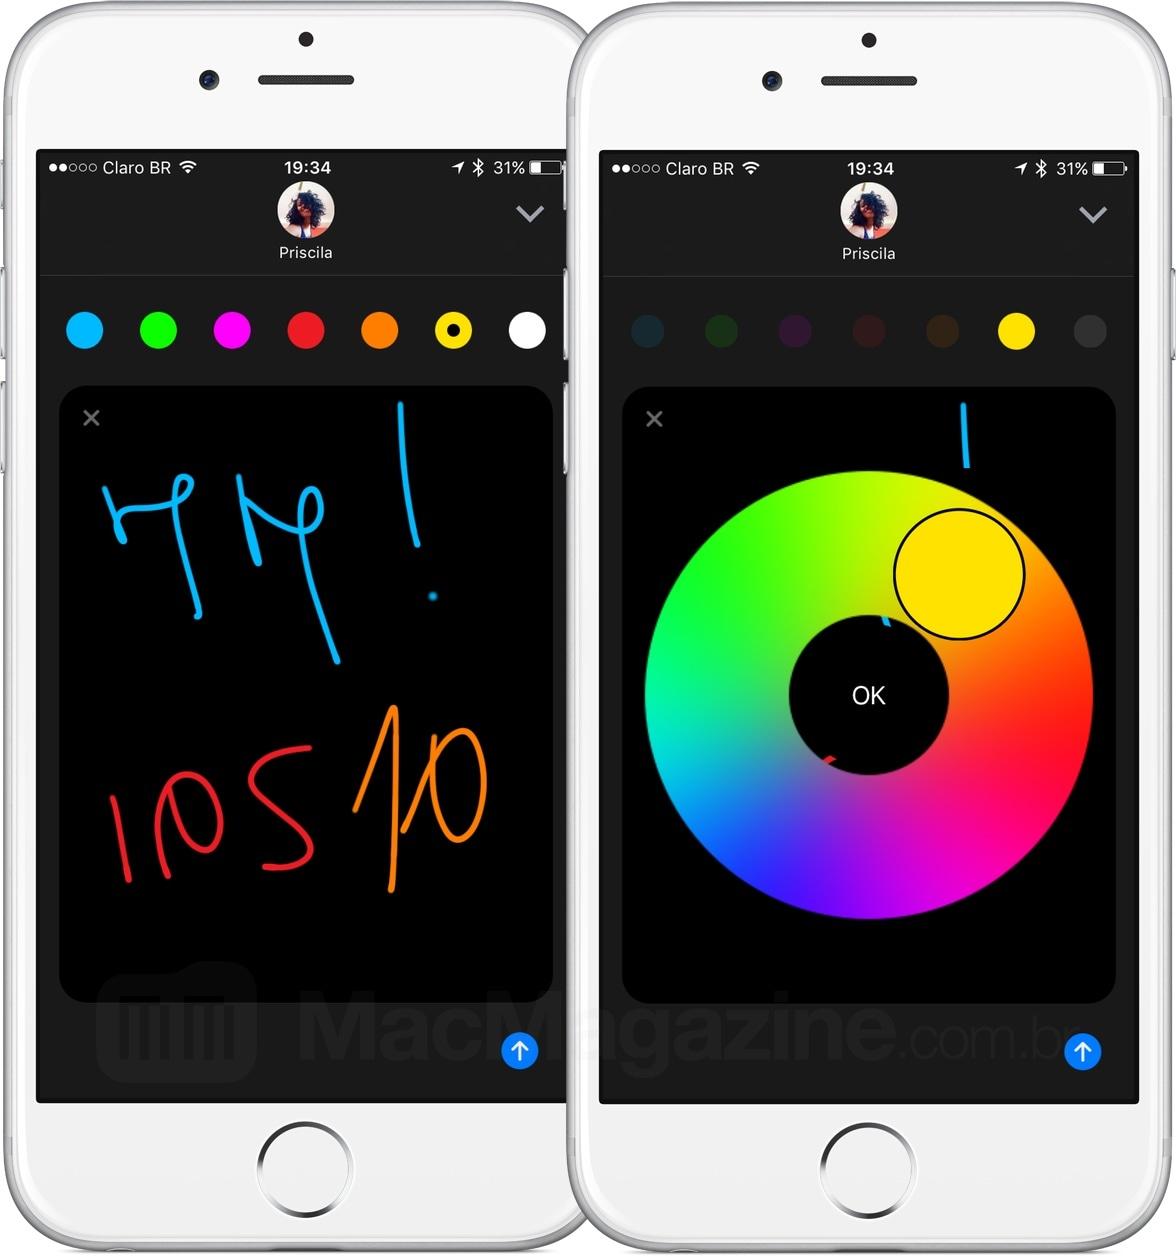 Digital Touch no iMessage do iOS 10